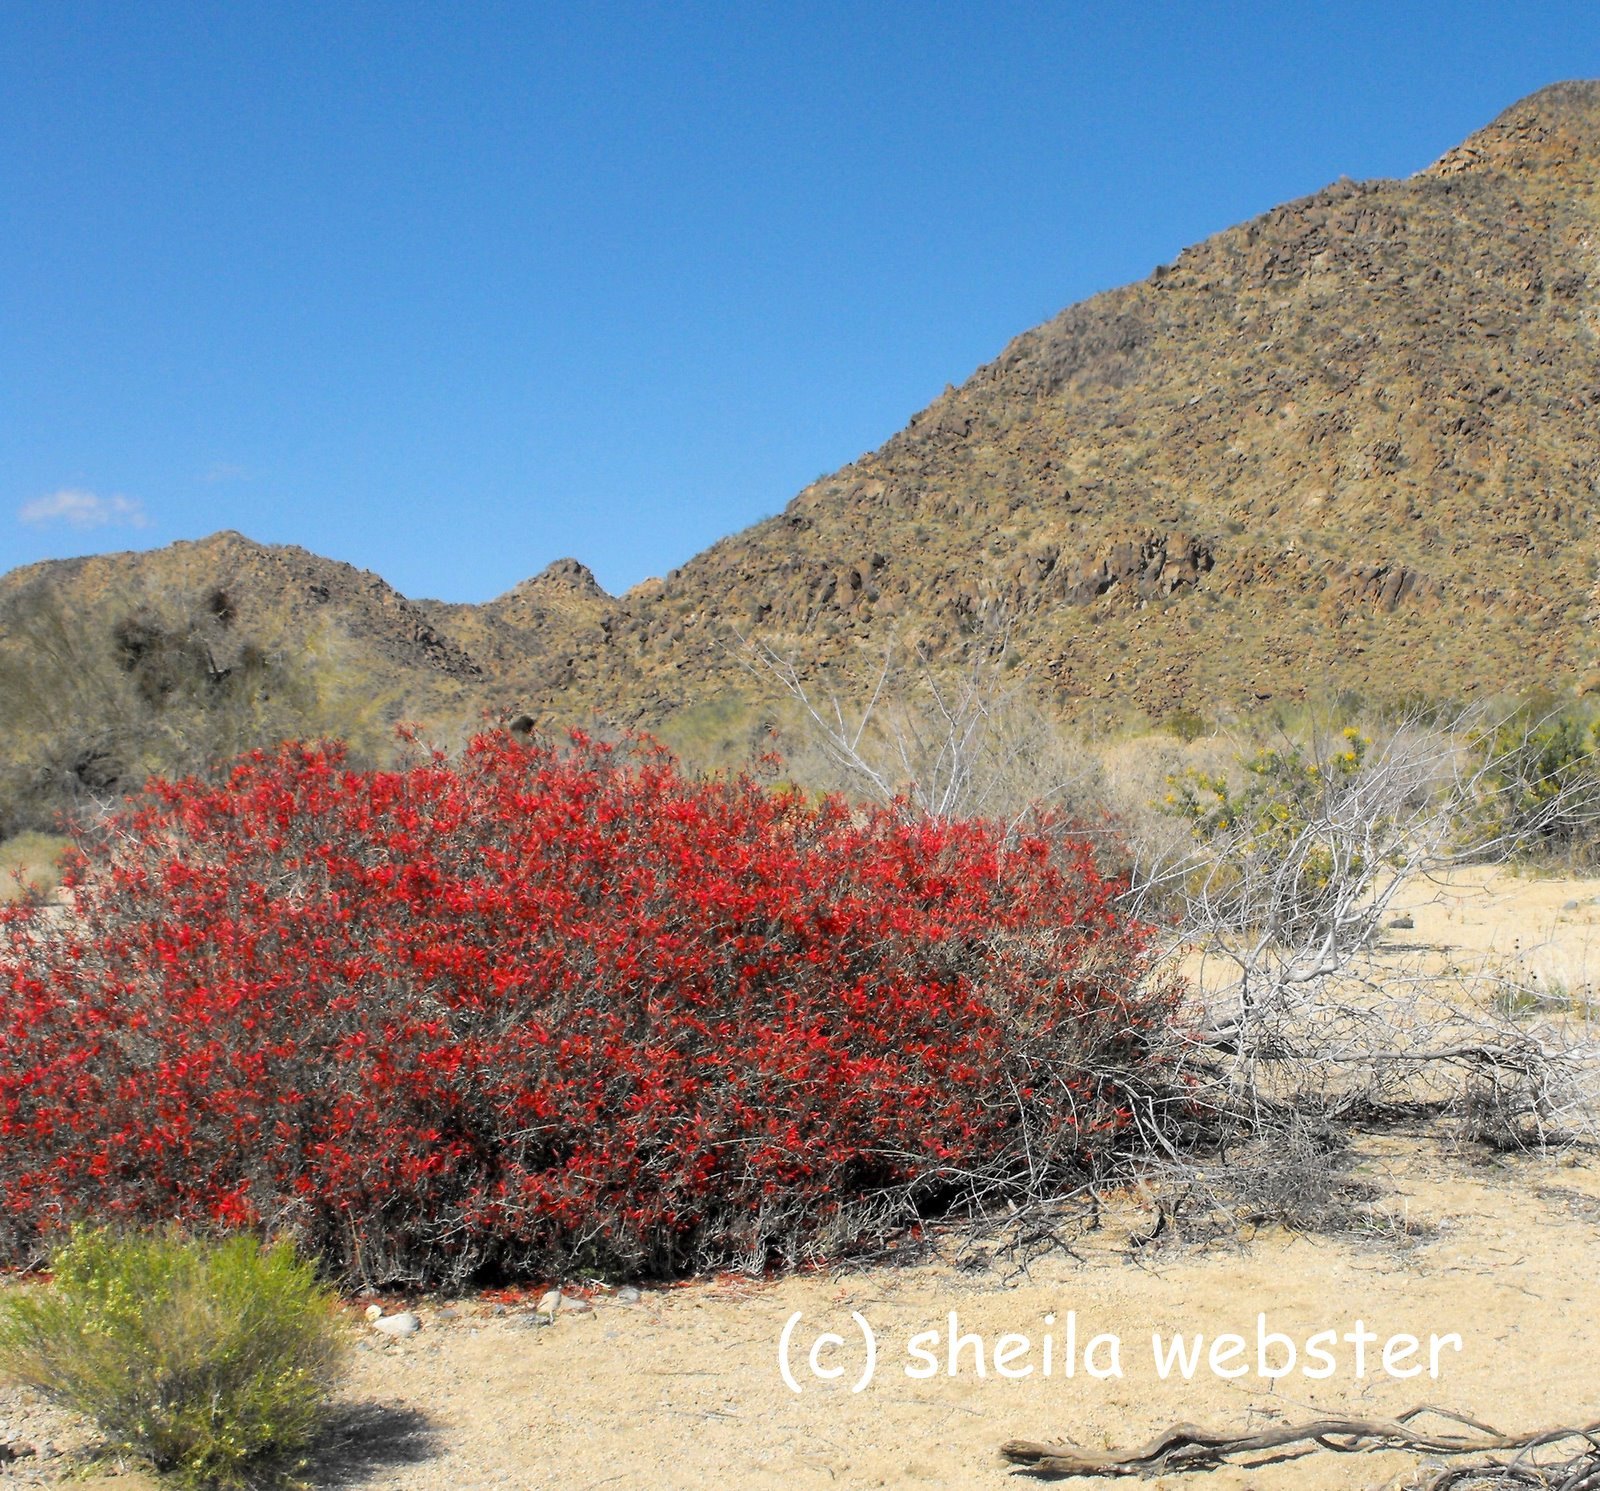 Mojave Desert Native Plants: We Love RV'ing: Joshua Tree National Park